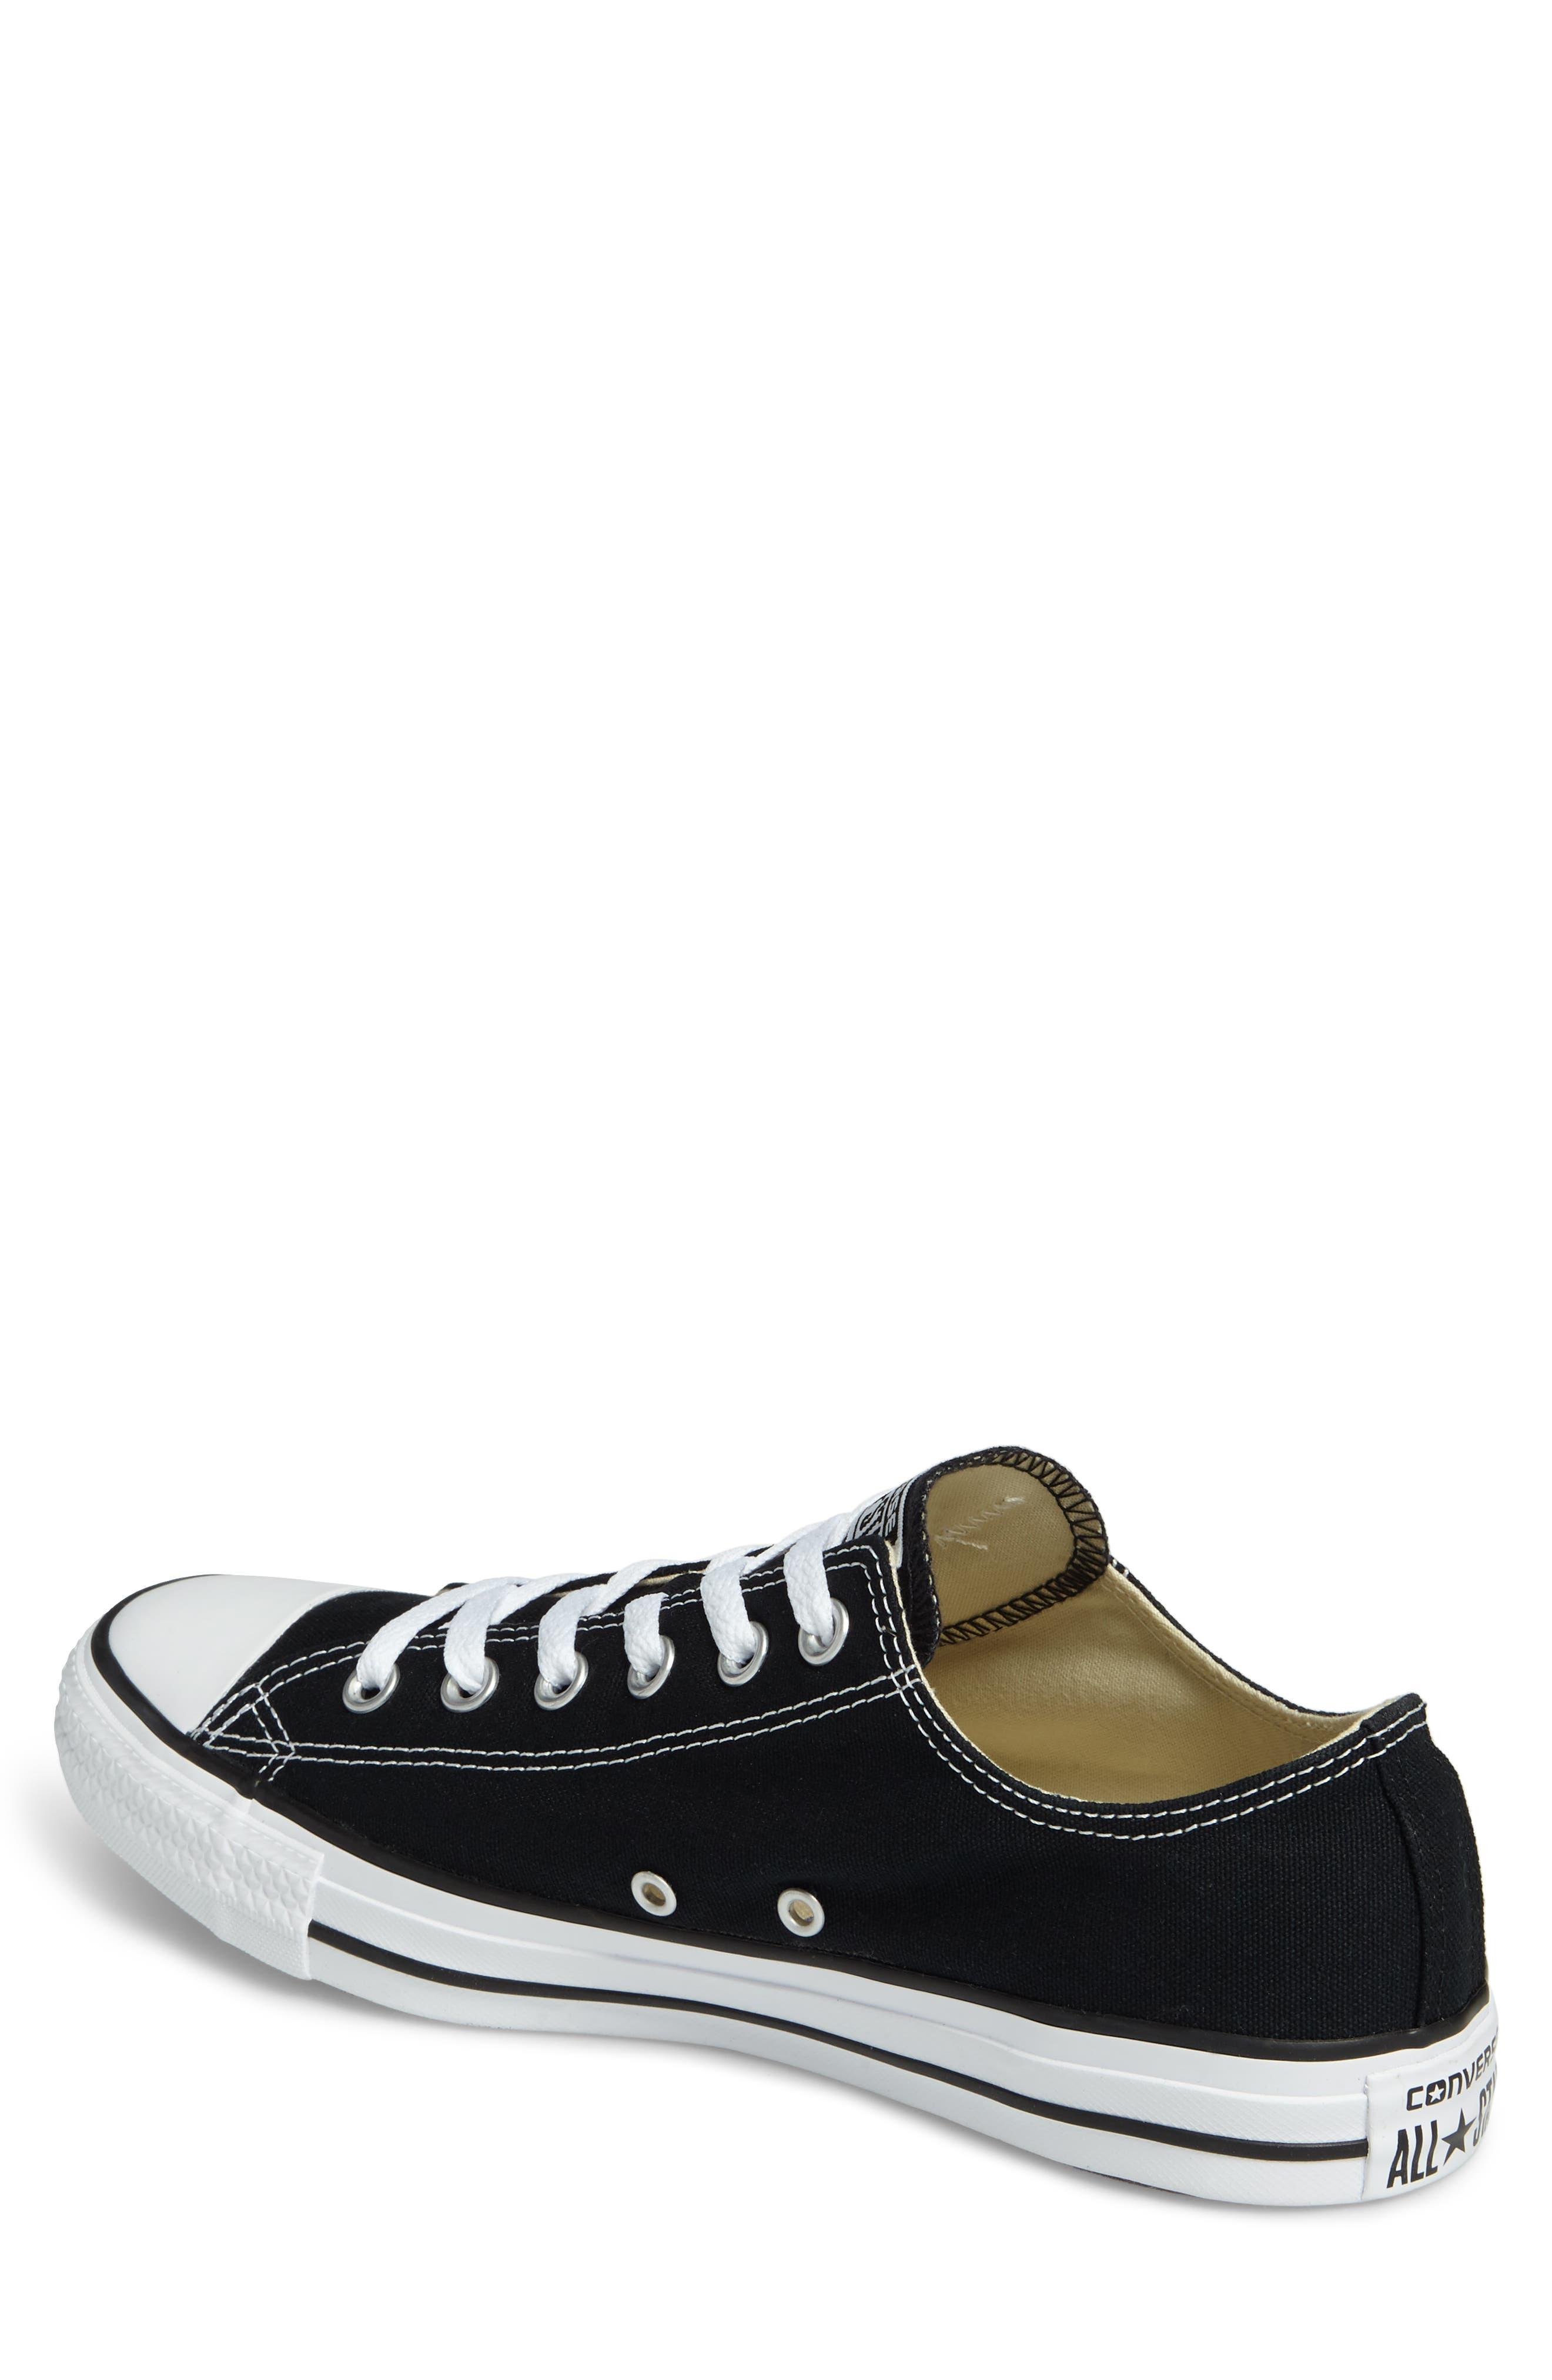 CONVERSE, Chuck Taylor<sup>®</sup> Low Sneaker, Alternate thumbnail 2, color, BLACK